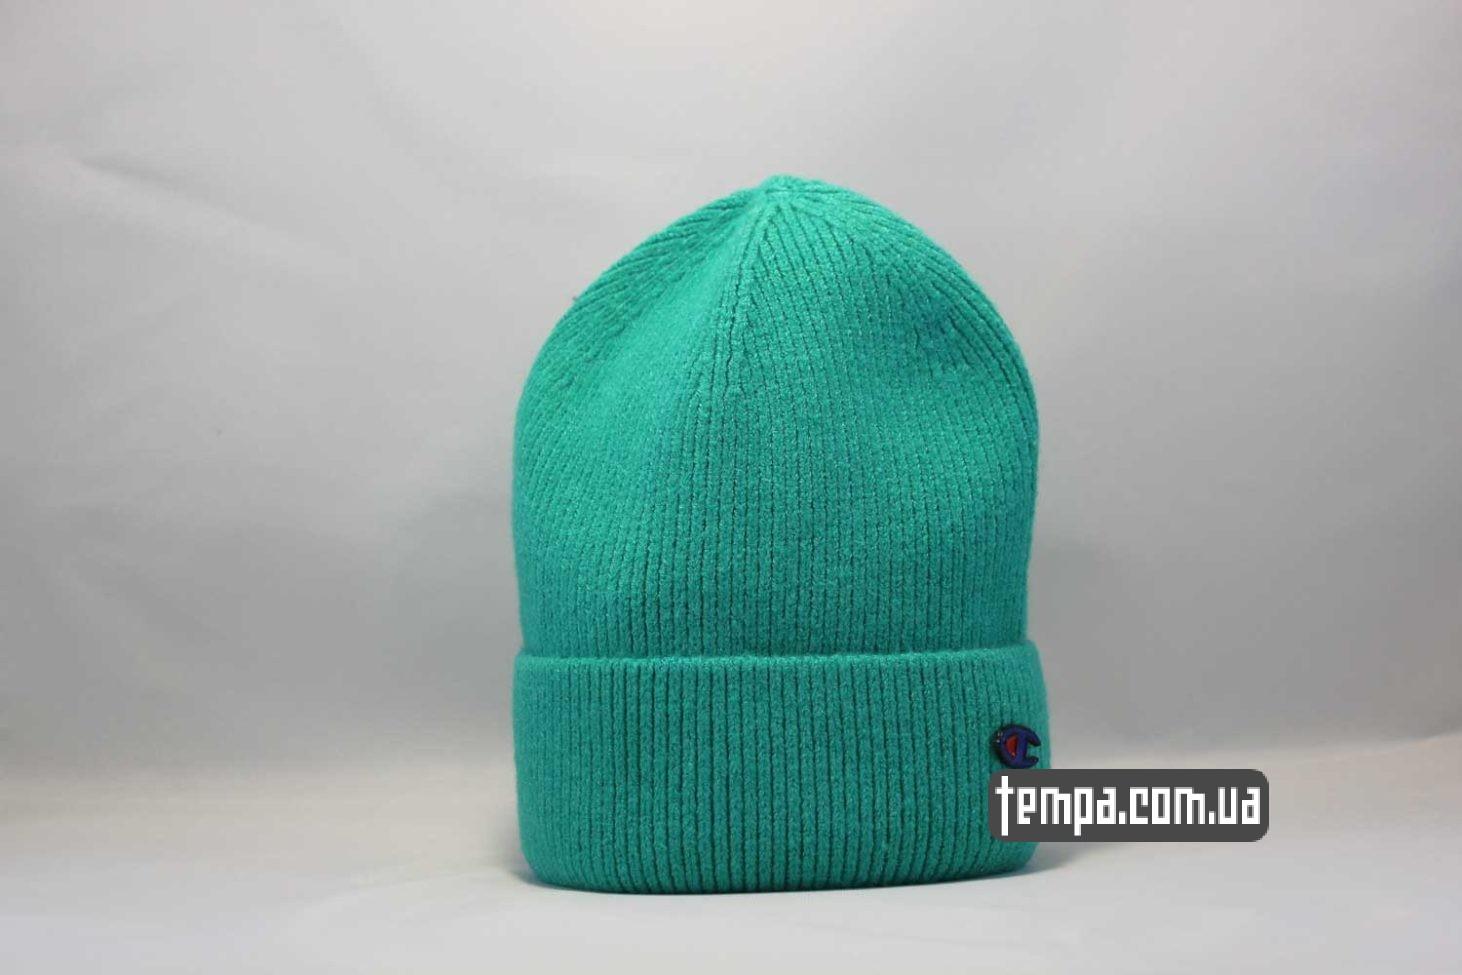 шапка beanie Champion green зеленая купить Украина